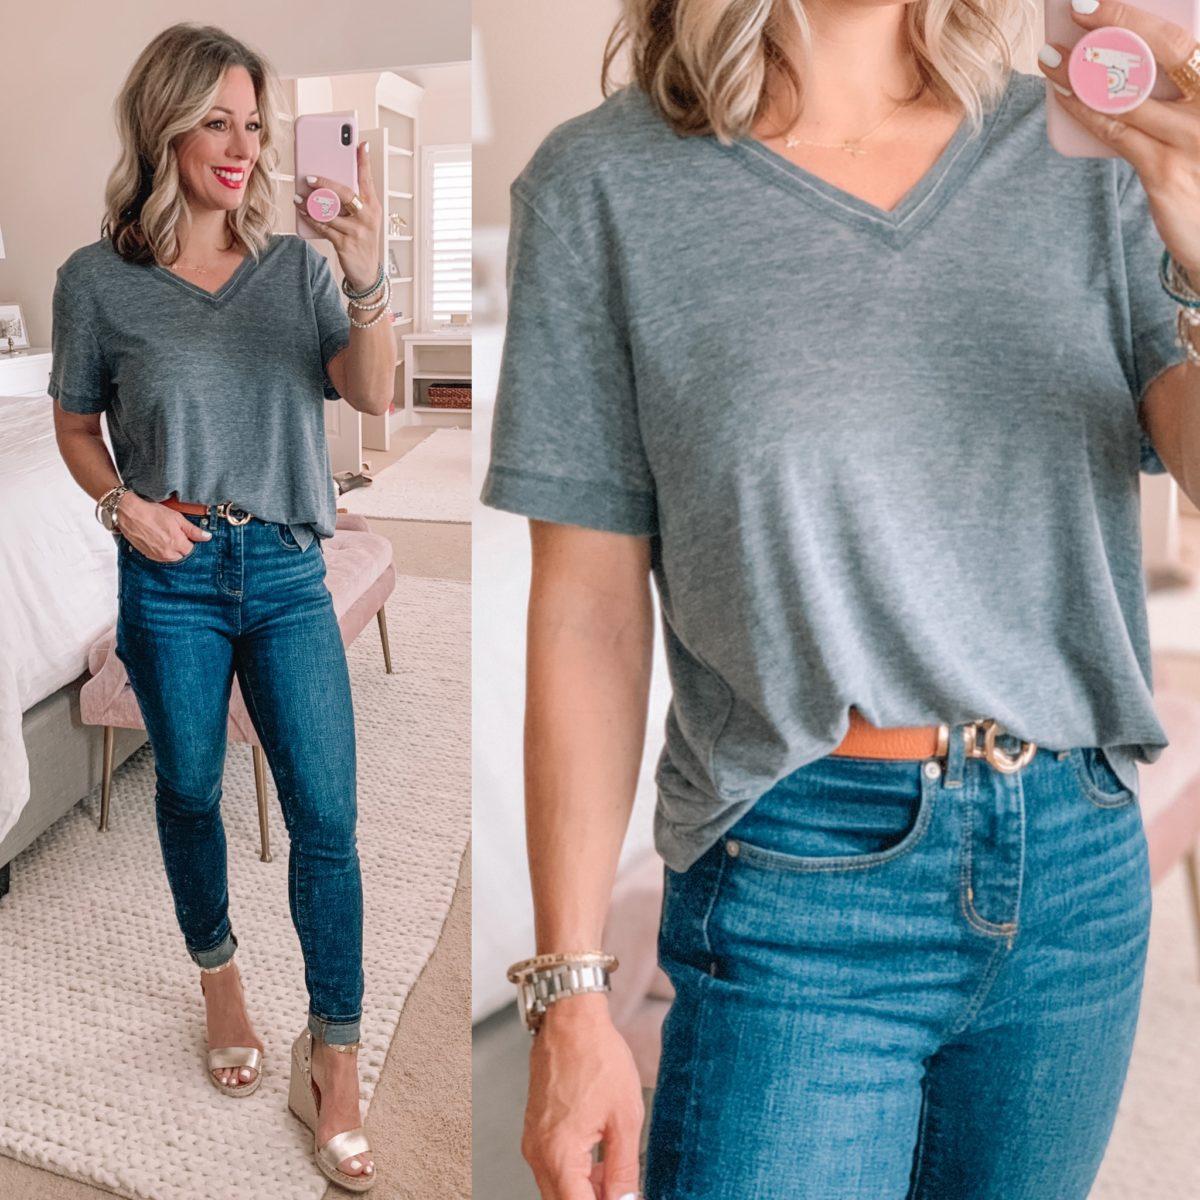 Grey Tee, Skinny Jeans, Gold Wedges